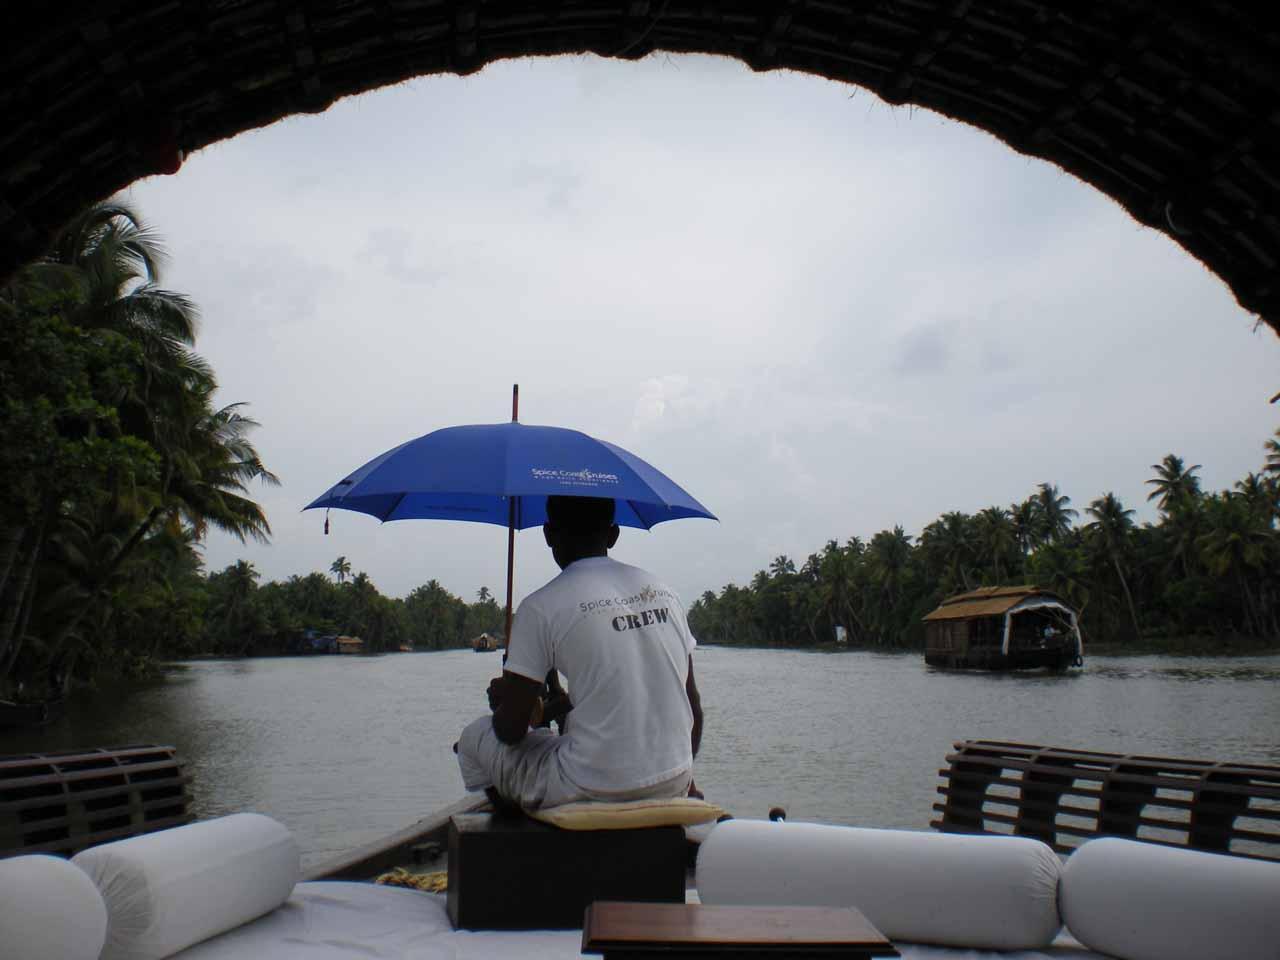 Our boat navigator